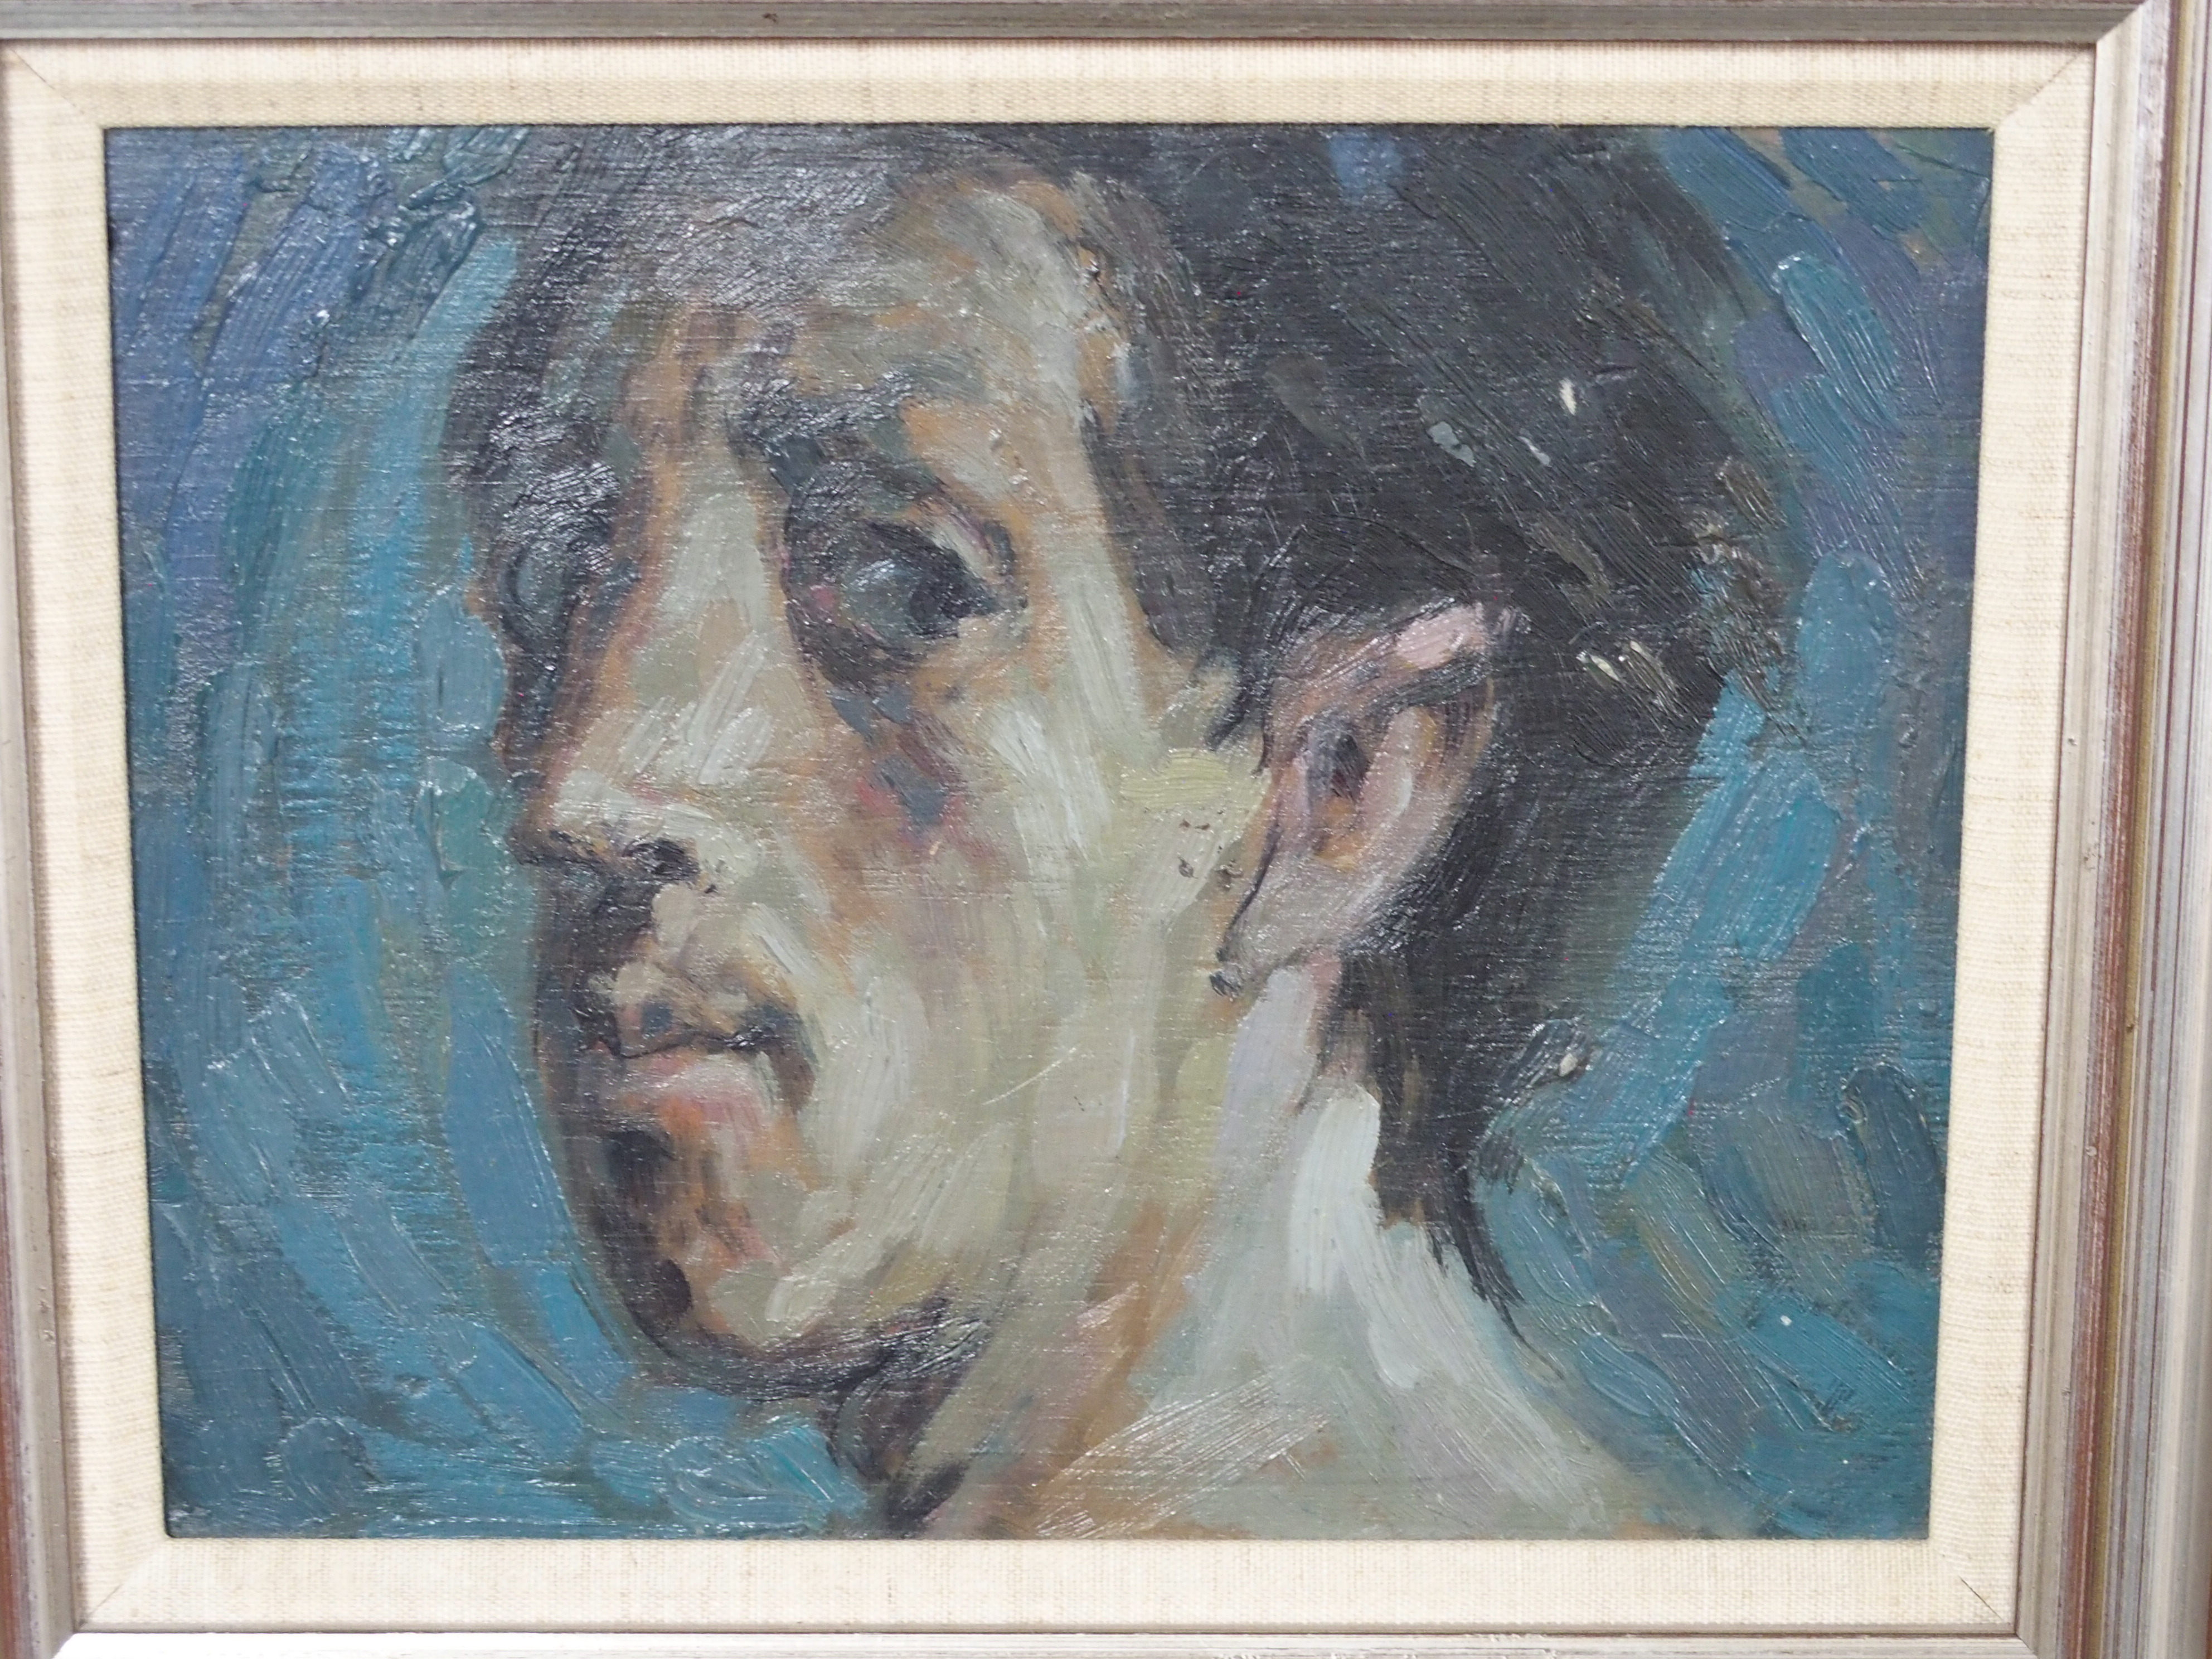 "•SCOTTISH SCHOOL (20TH CENTURY) MALE PORTRAIT HEAD STUDY Oil on panel, 20 x 25cm (8 x 9 3/4"")"